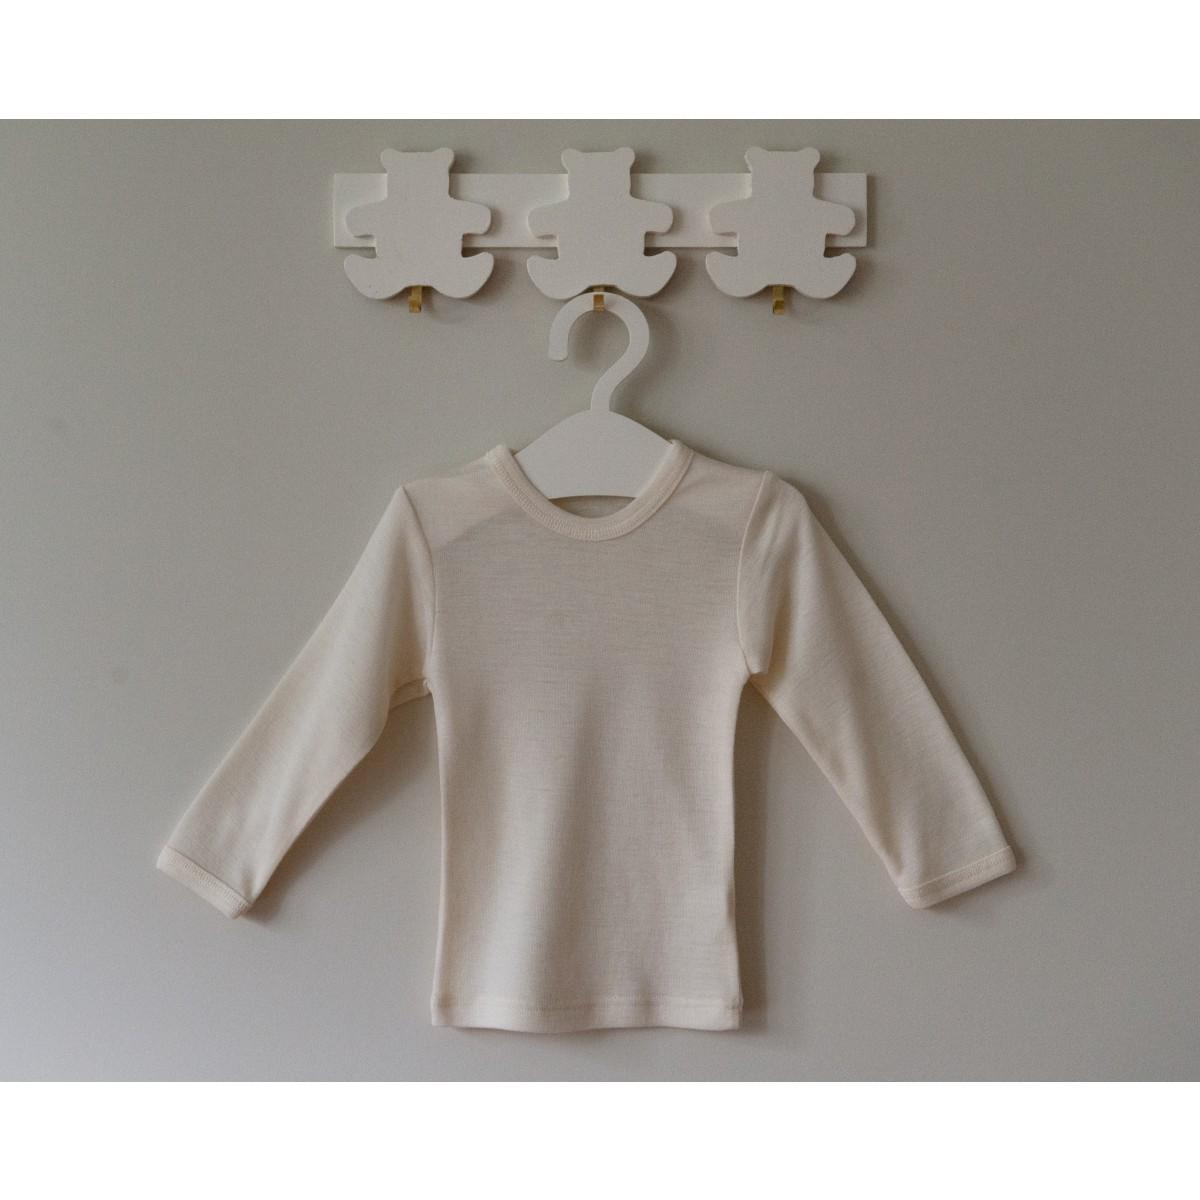 Bērnu džemperis Vilaurita, merino vilna 226